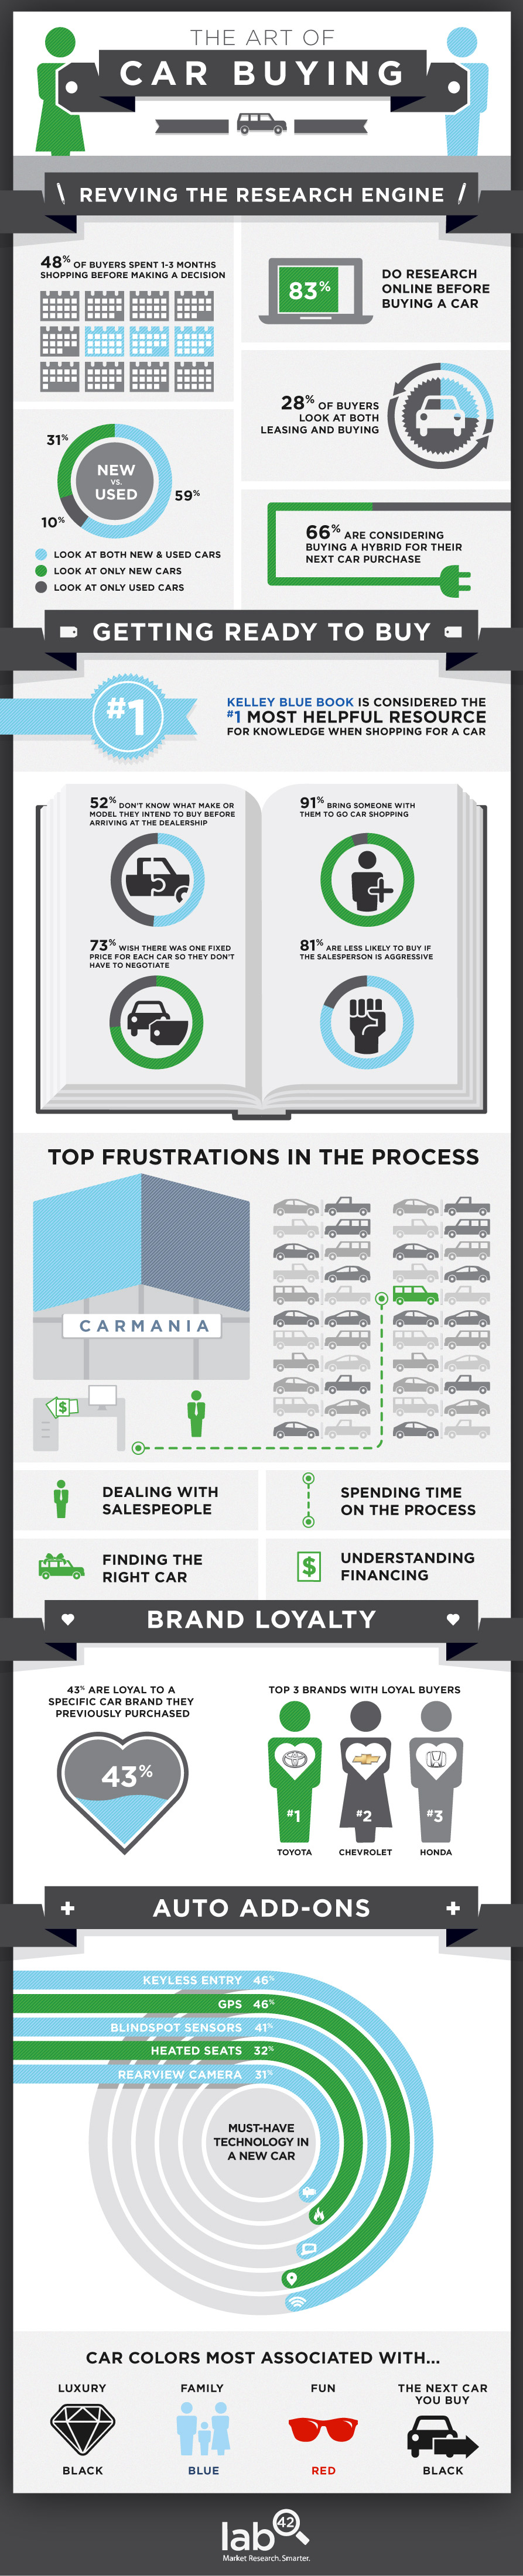 Lab42 Car Buying Infographic